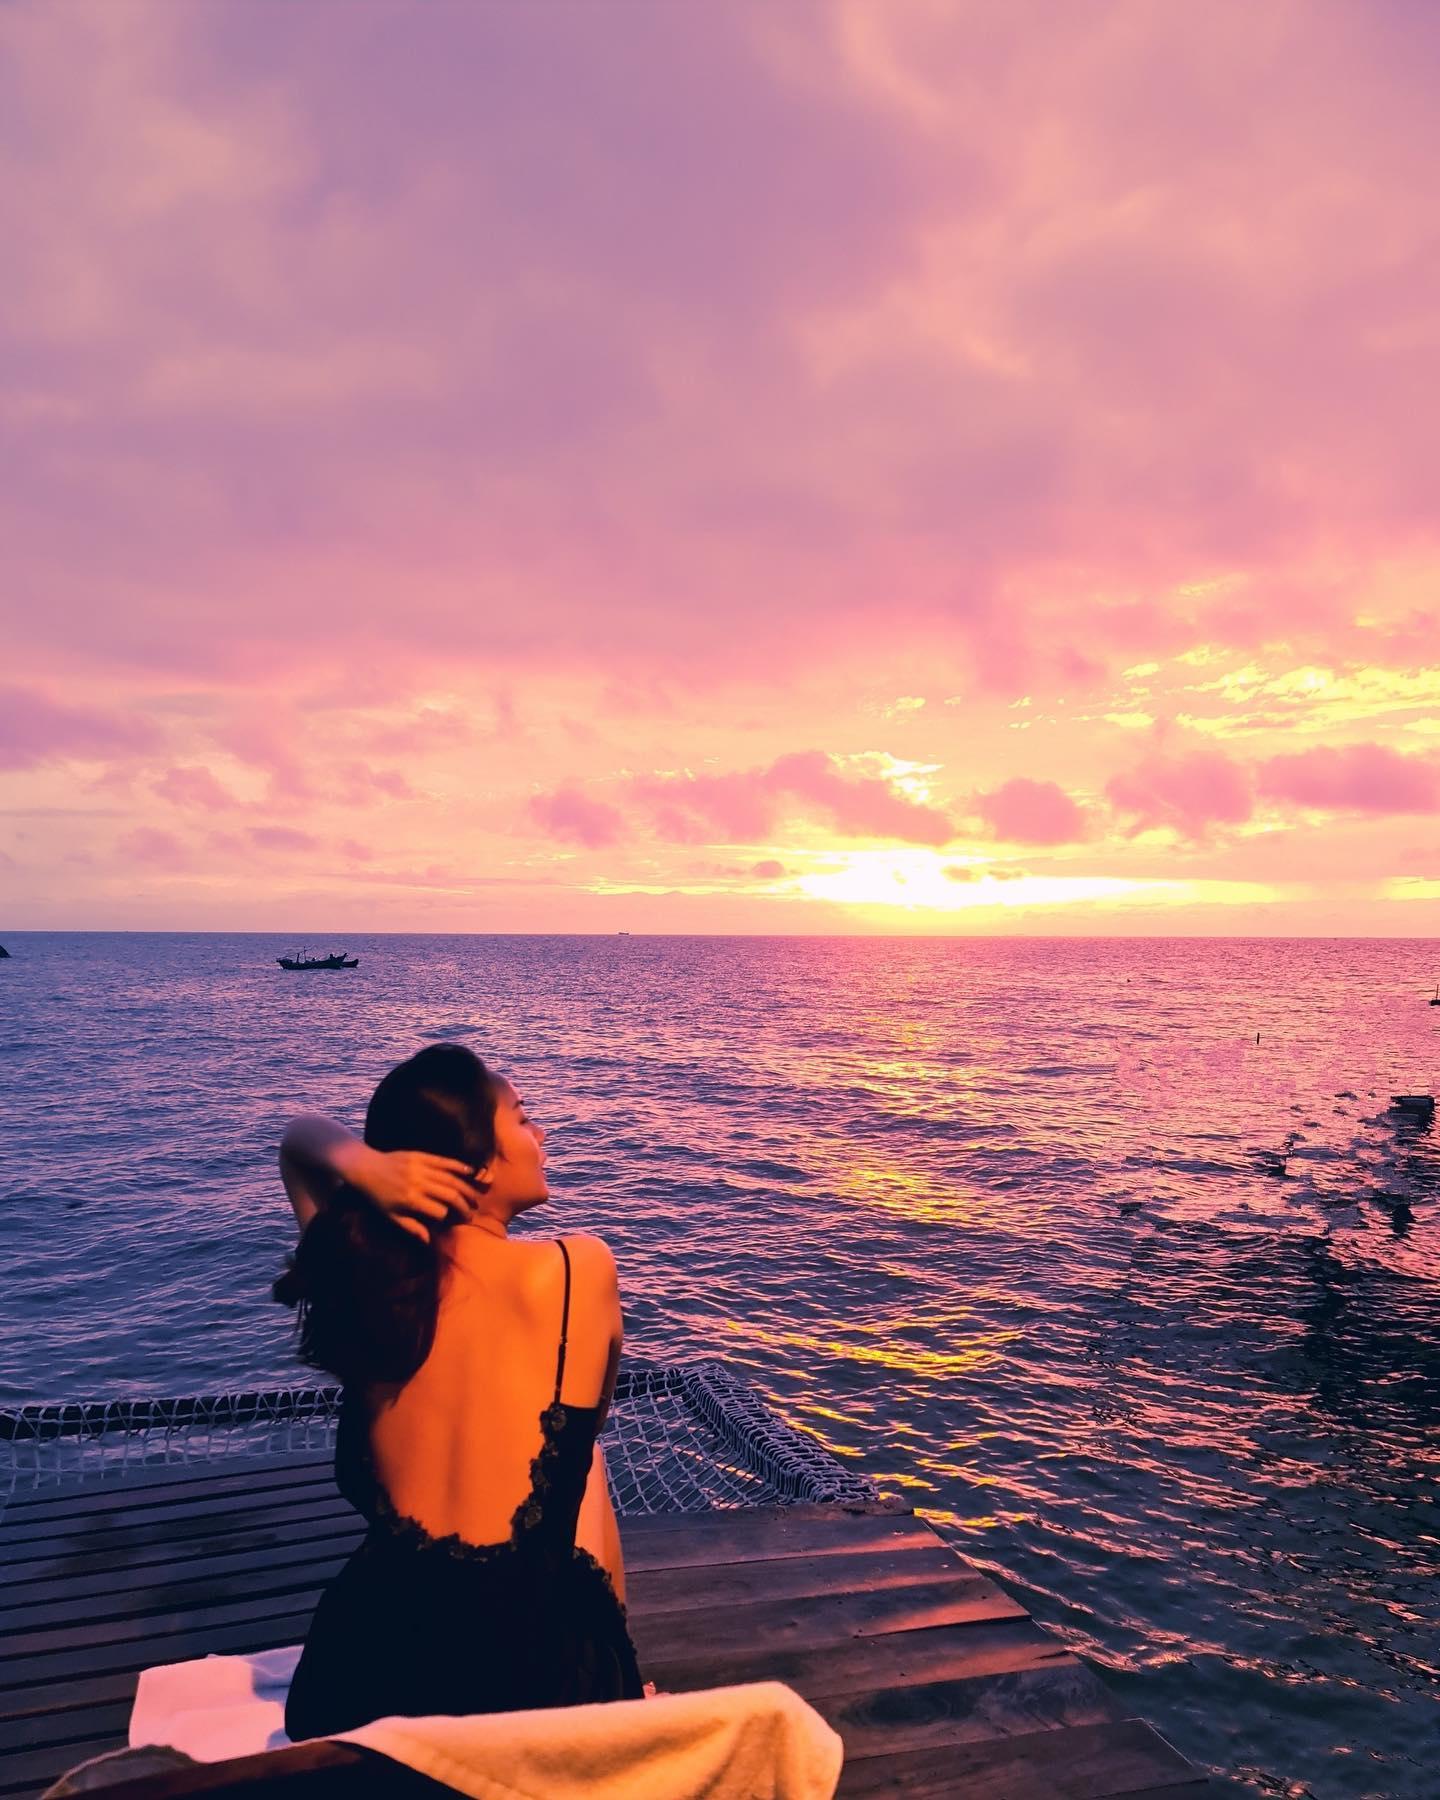 Lotus Home Phú Quốc, tuân cuồng chân, tuancuongchan, reciew du lịch, du lịch chất